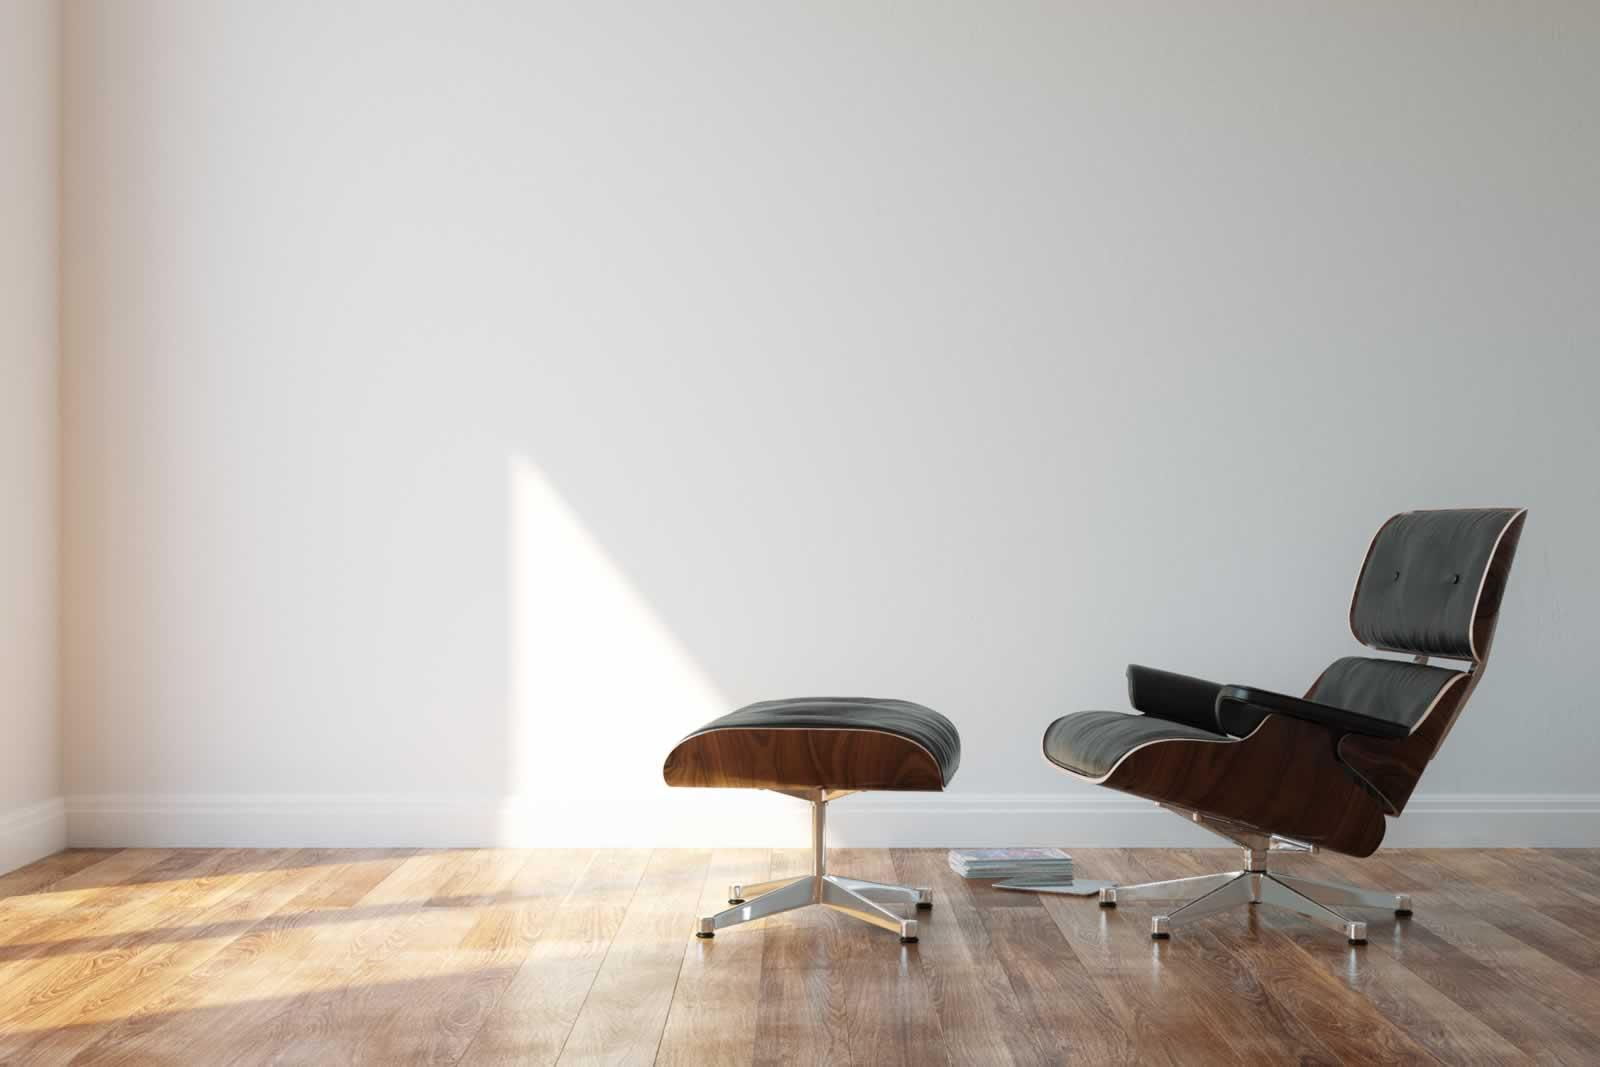 montageservice zarnescu. Black Bedroom Furniture Sets. Home Design Ideas